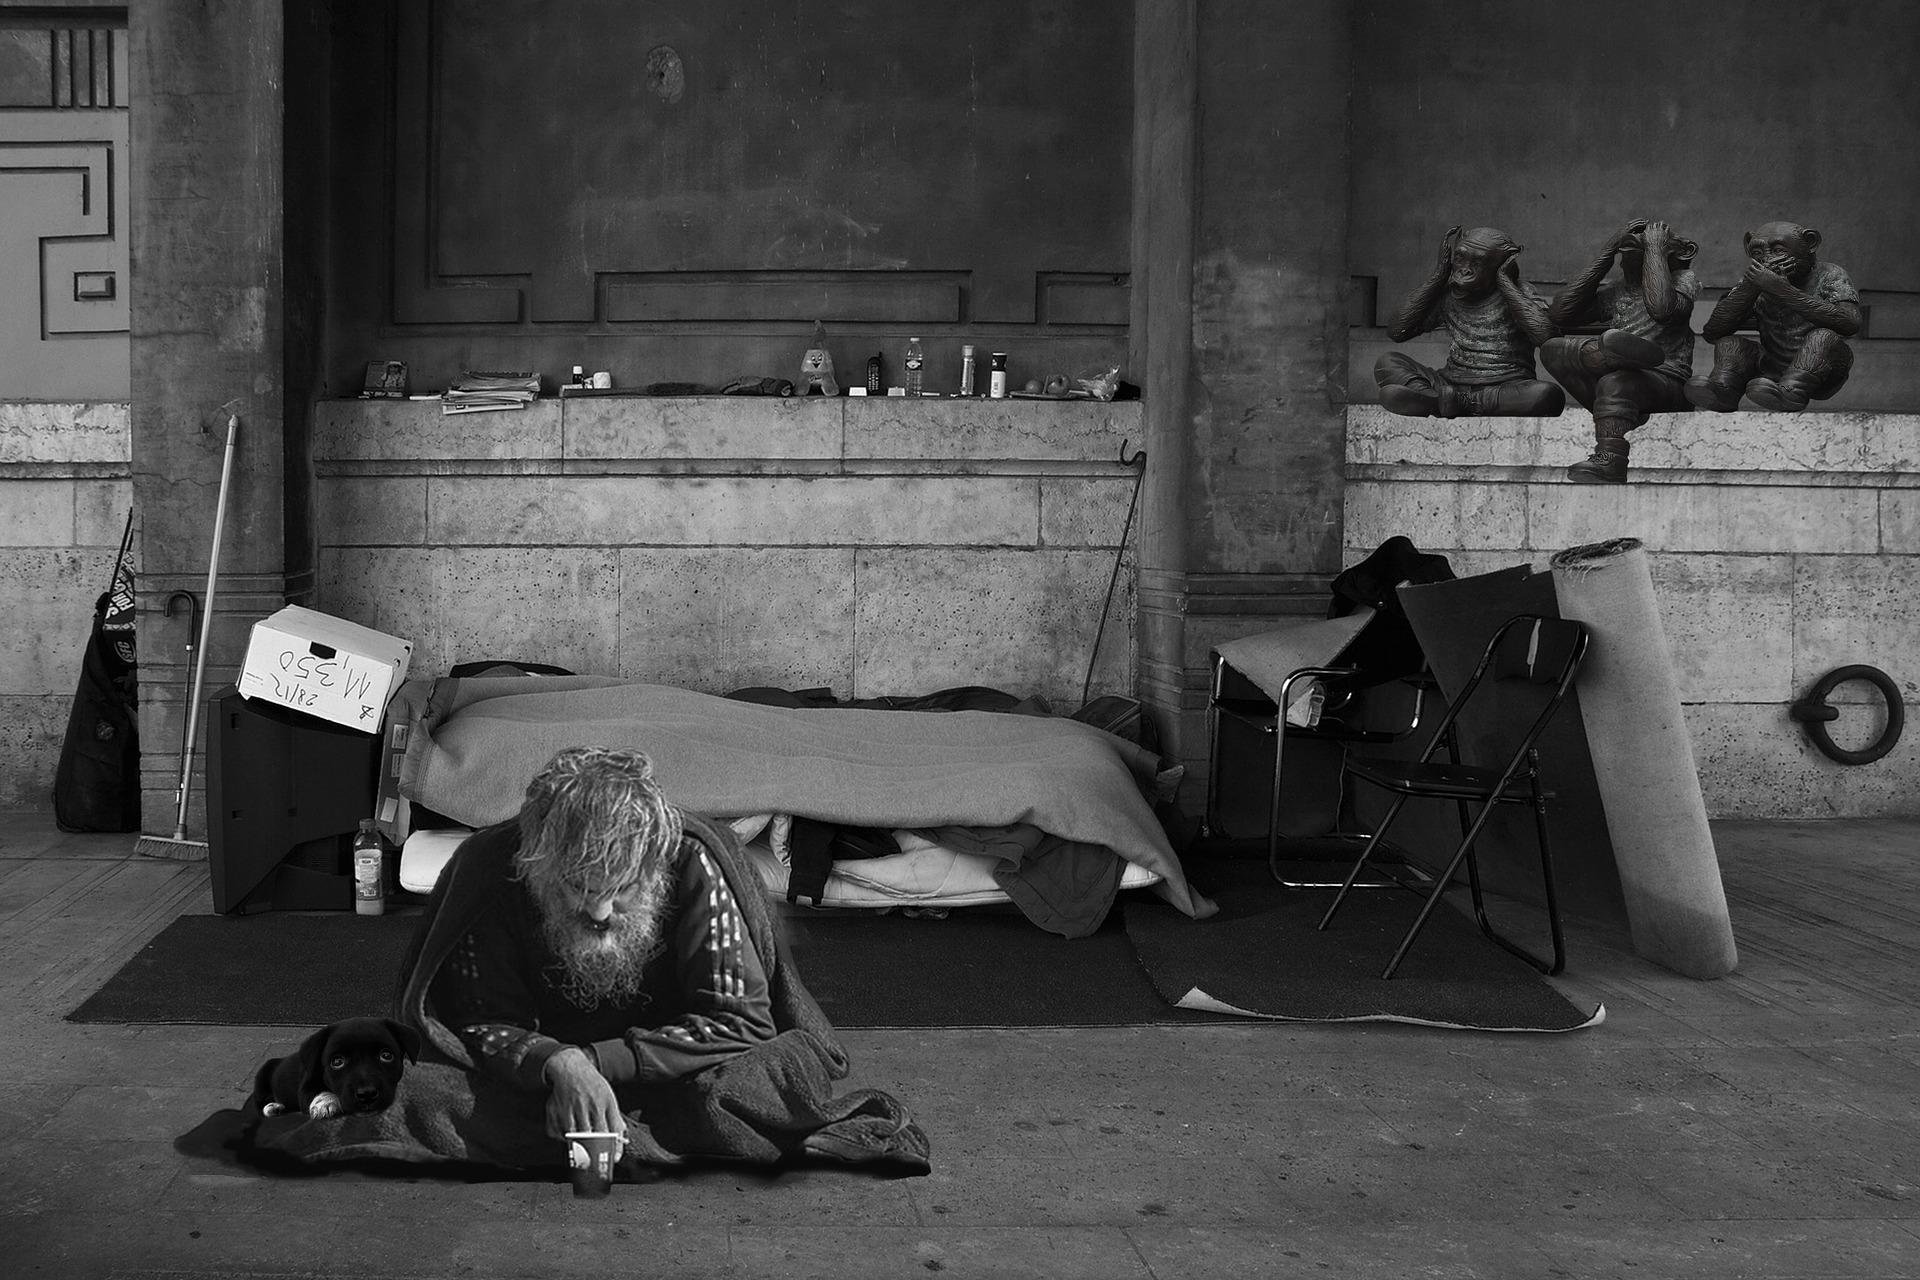 GraceReceived:homeless-man-2653445_1920